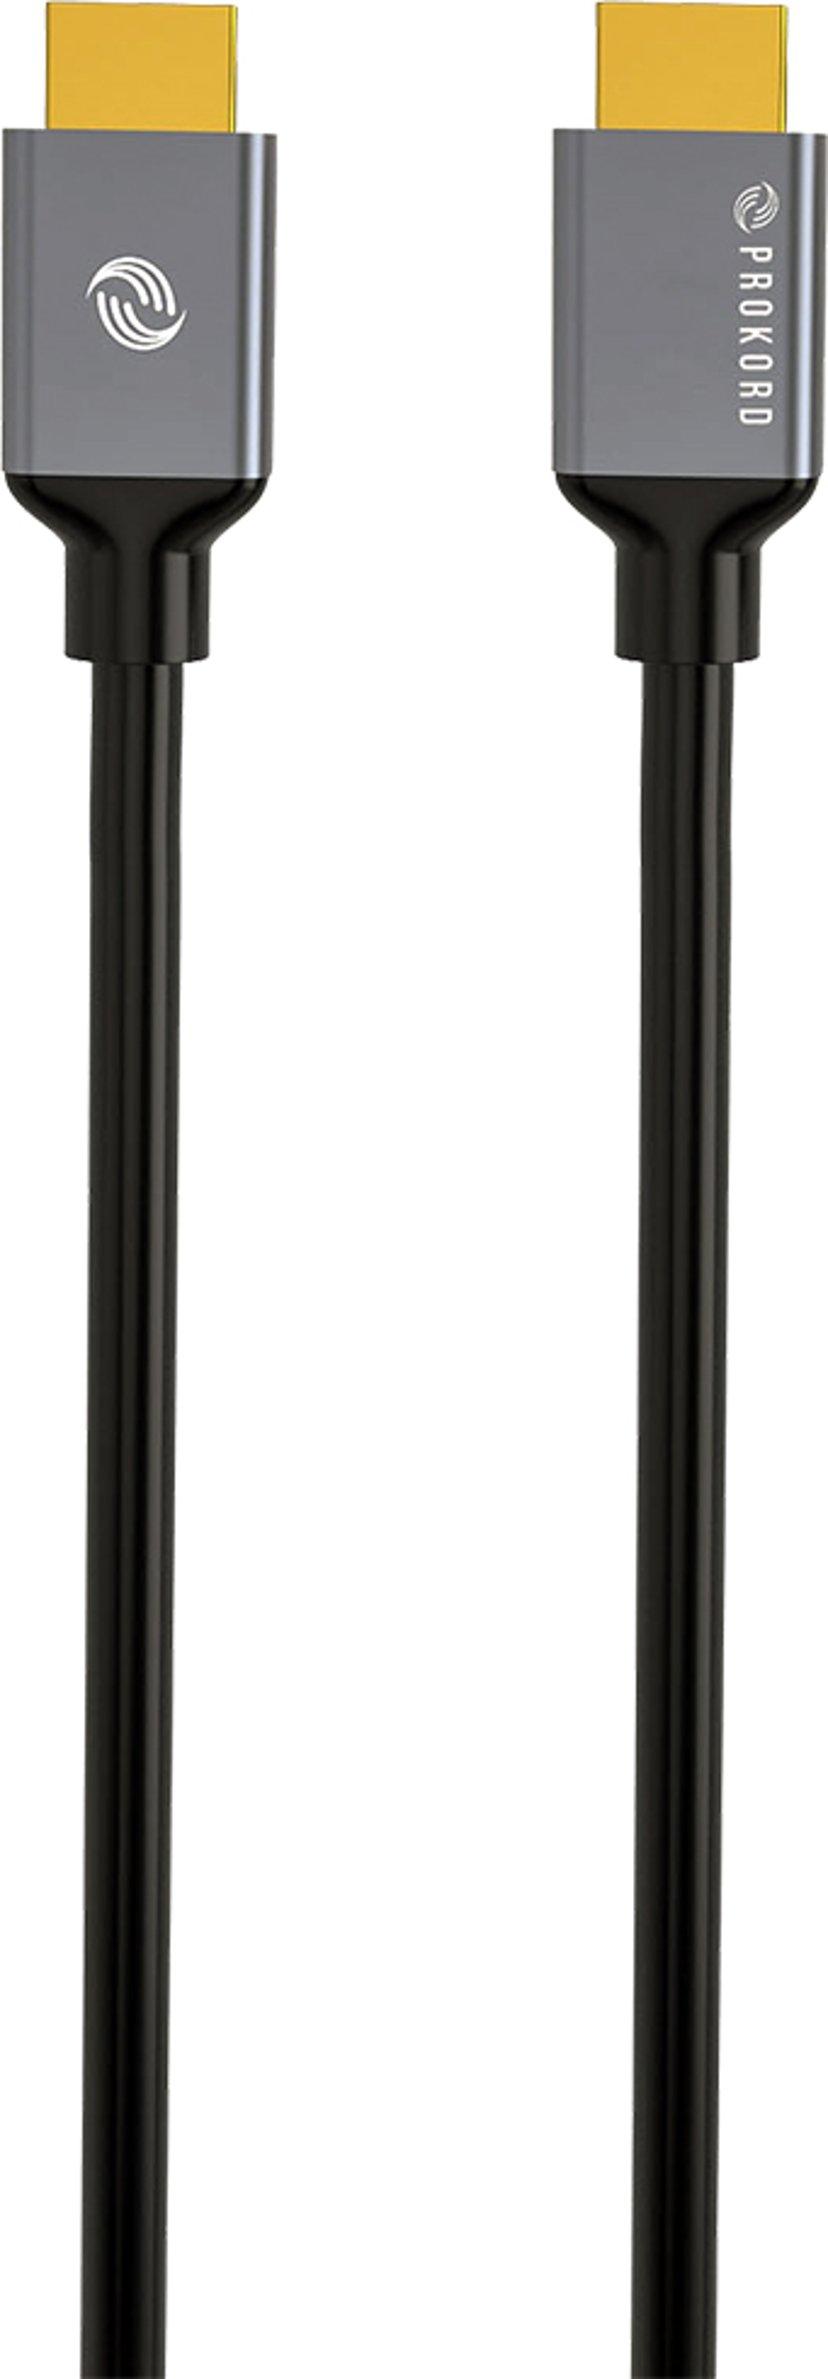 Prokord Black HDMI 2.0 2.0m 2m HDMI Hane HDMI Hane